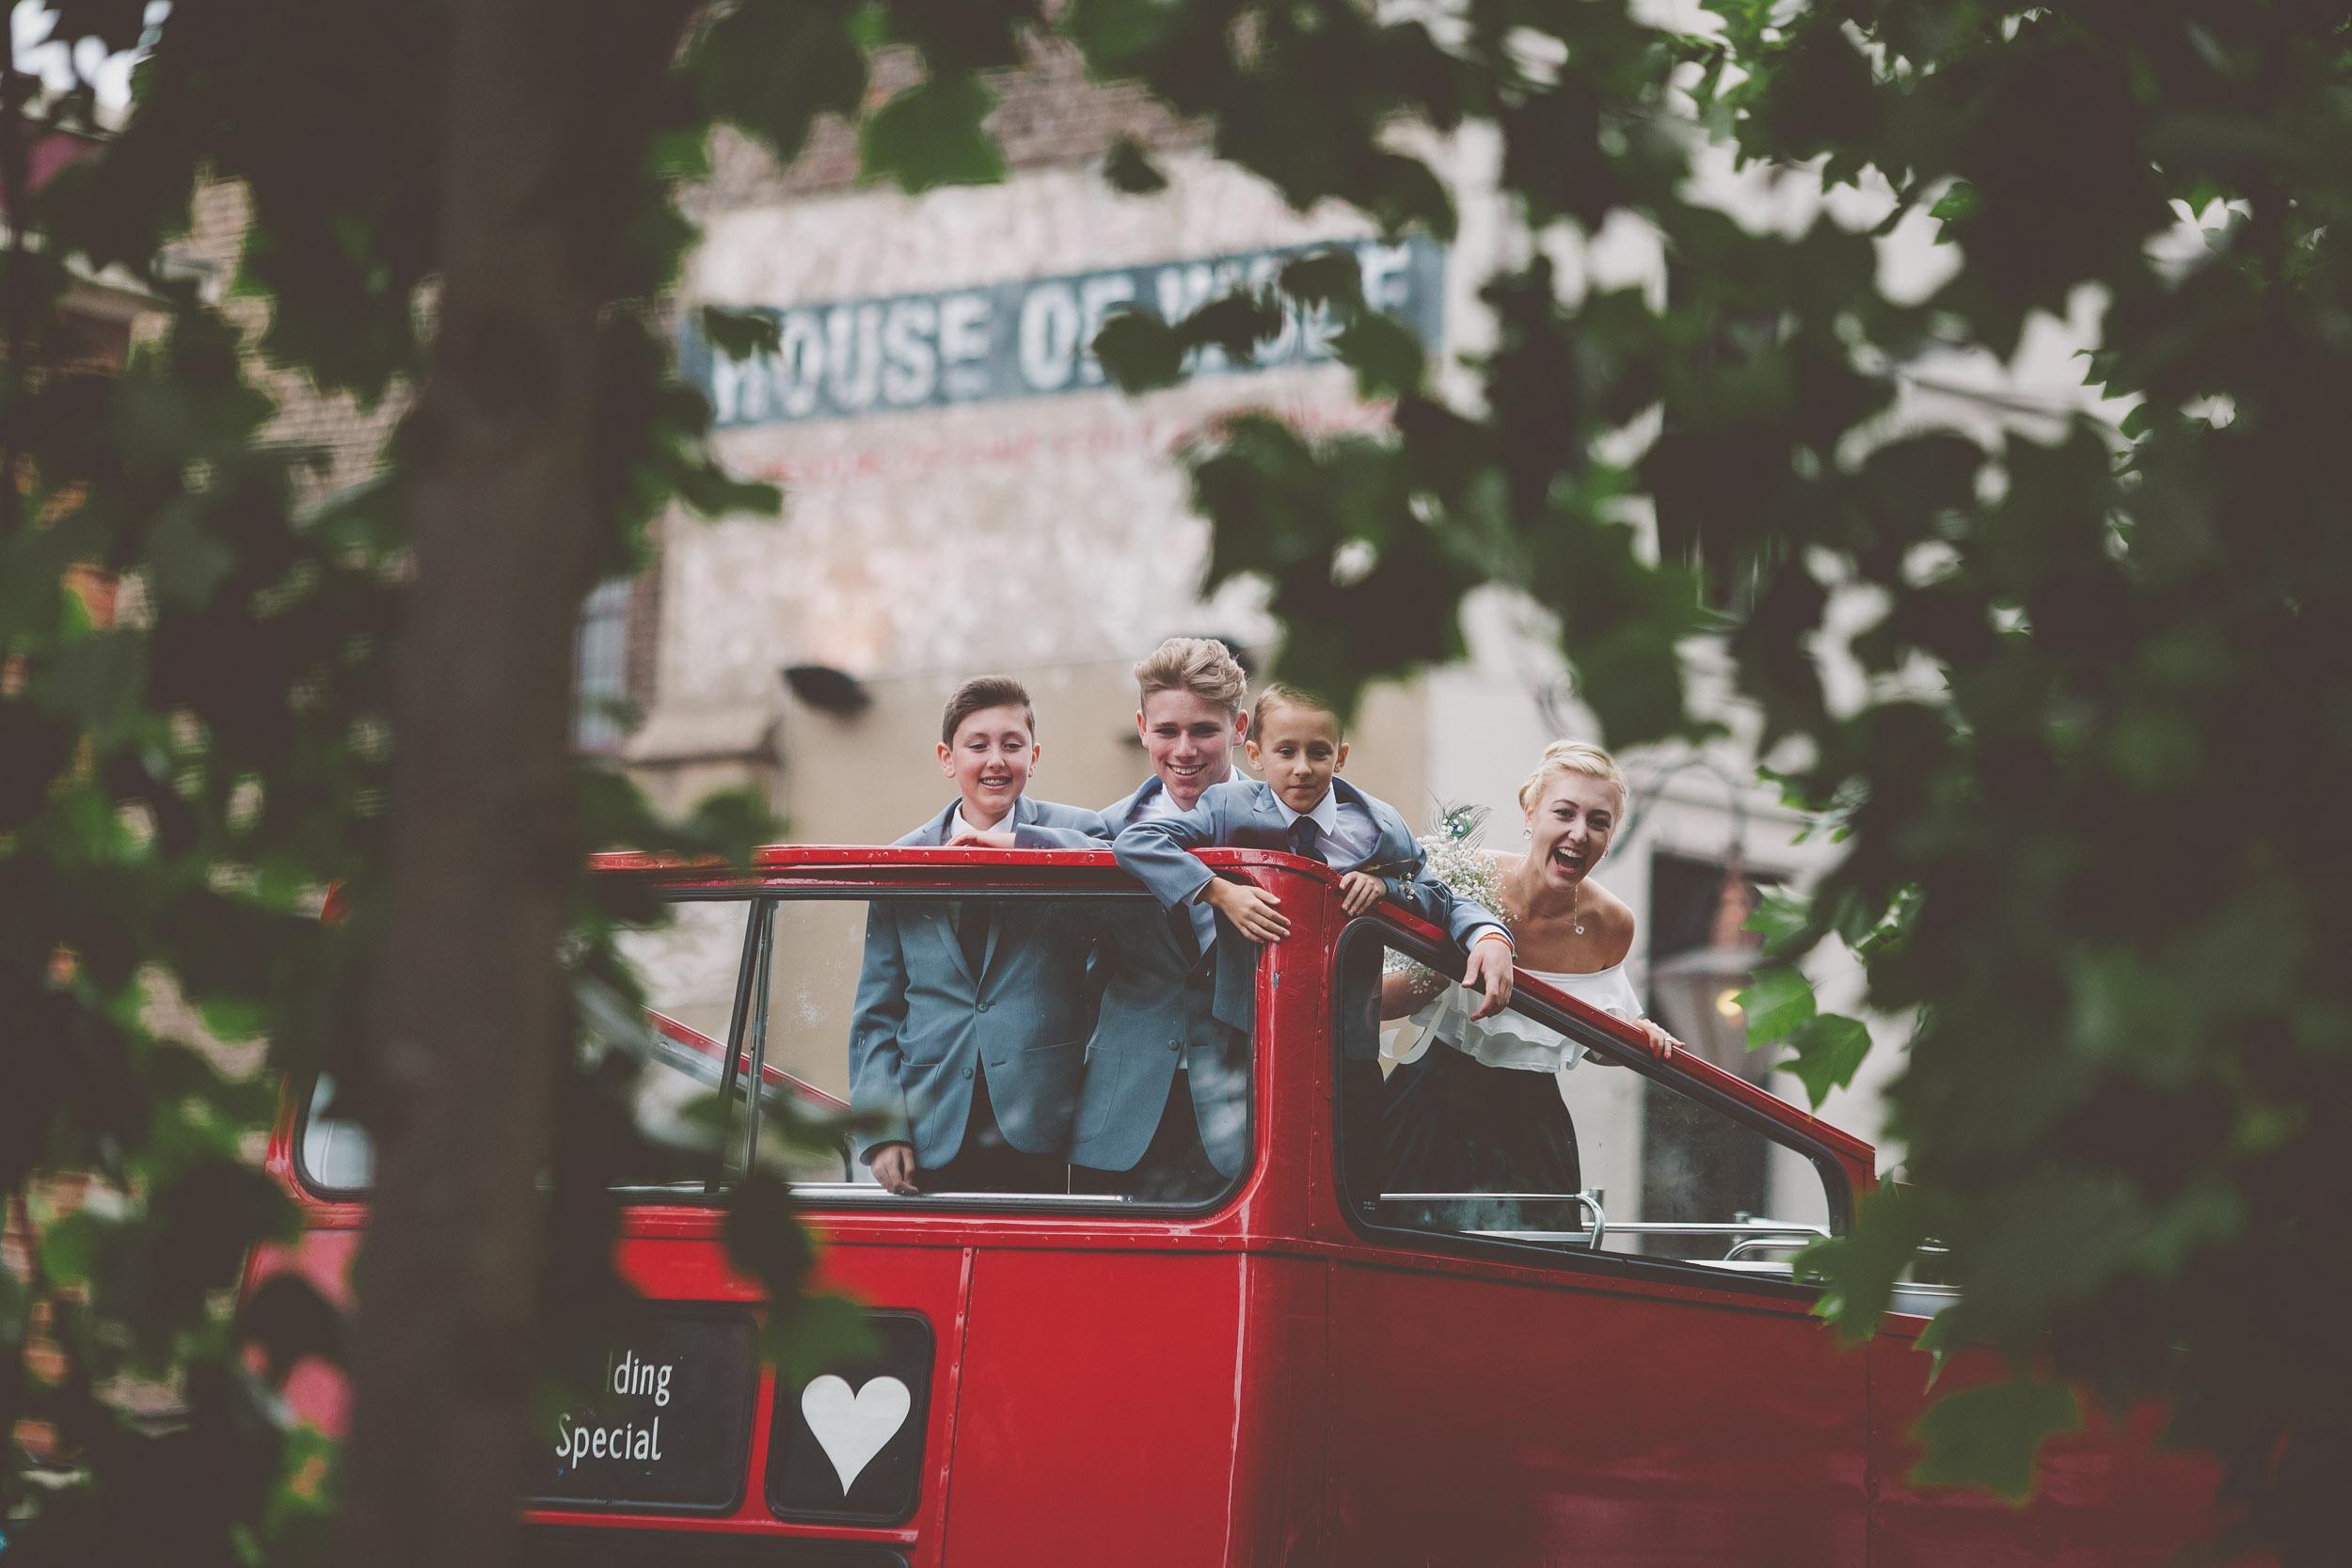 islington-town-hall-4th-floor-studios-wedding174.jpg